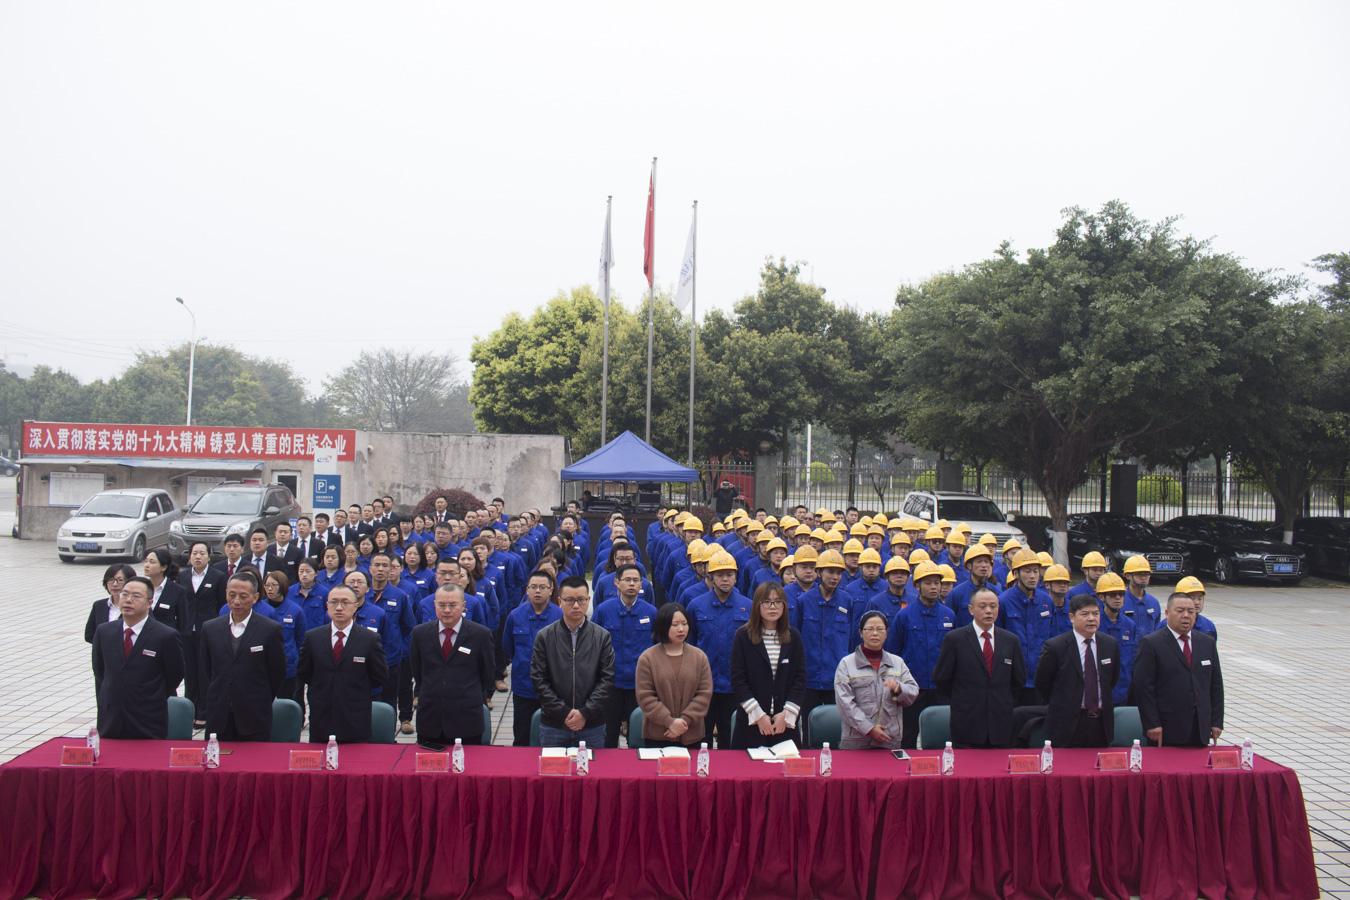 http://qiniu.cloudhong.com/image_2019-03-25_5c98d5d979d77.JPG